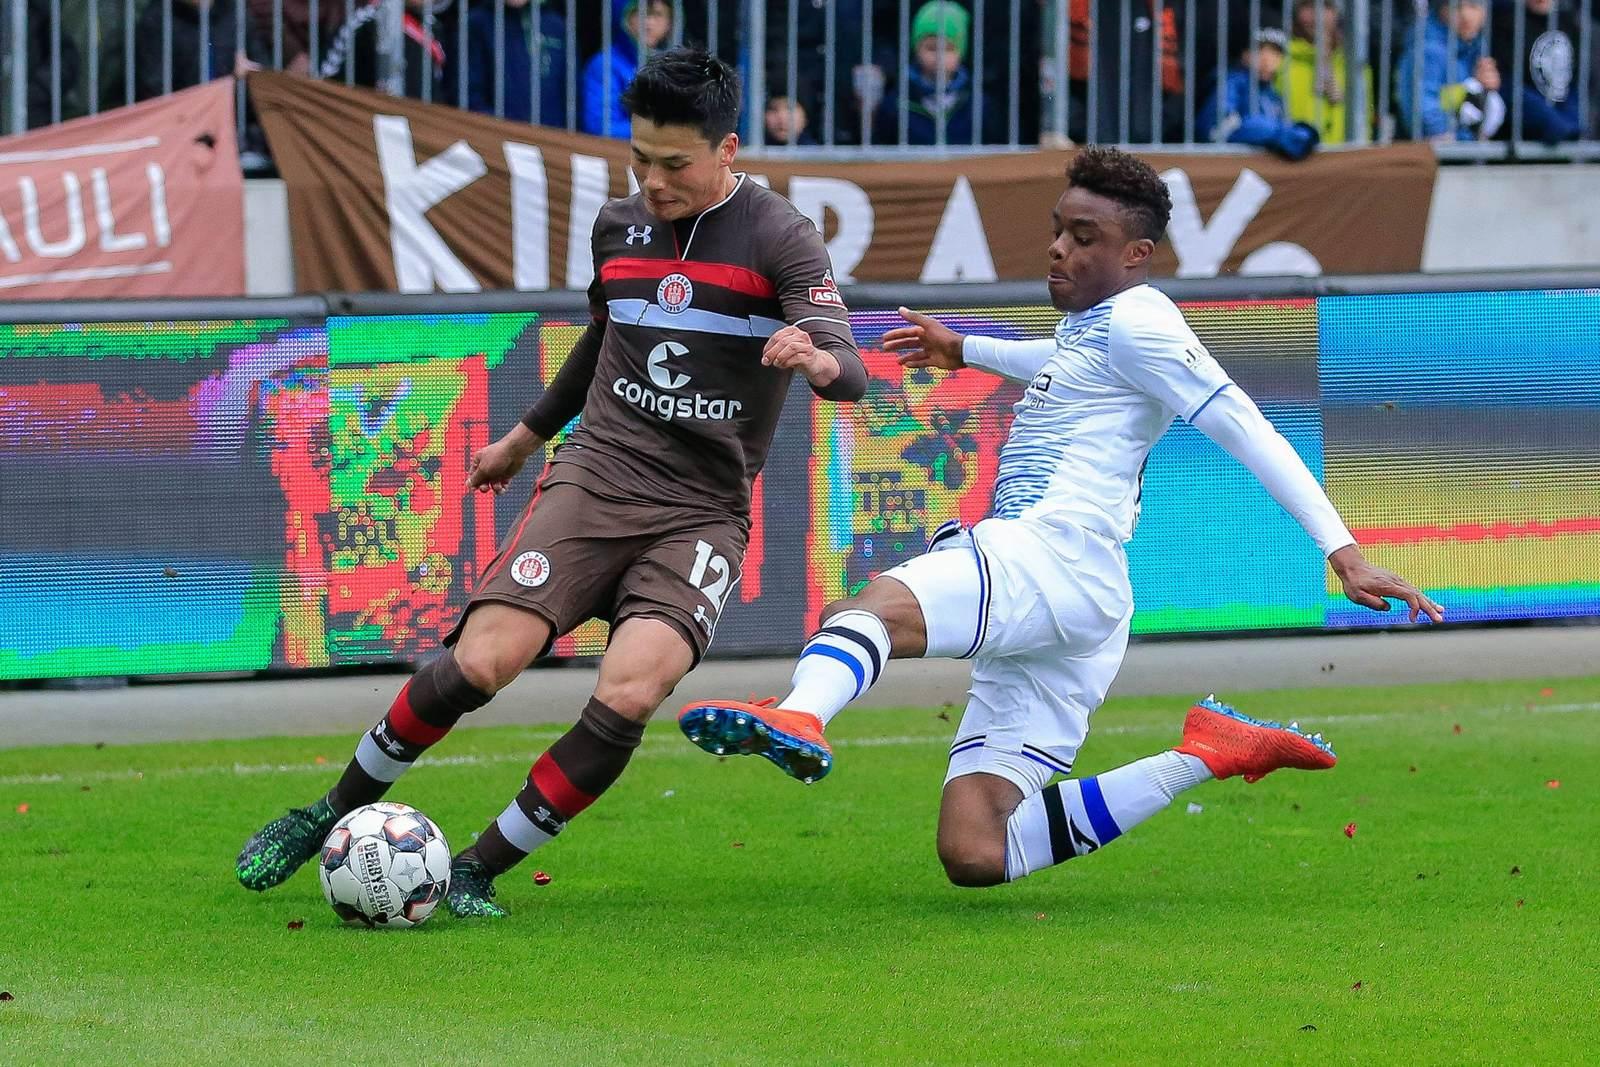 Ryo Miyaichi vom FC St. Pauli gegen Anderson Lucoqui von Arminia Bielefeld